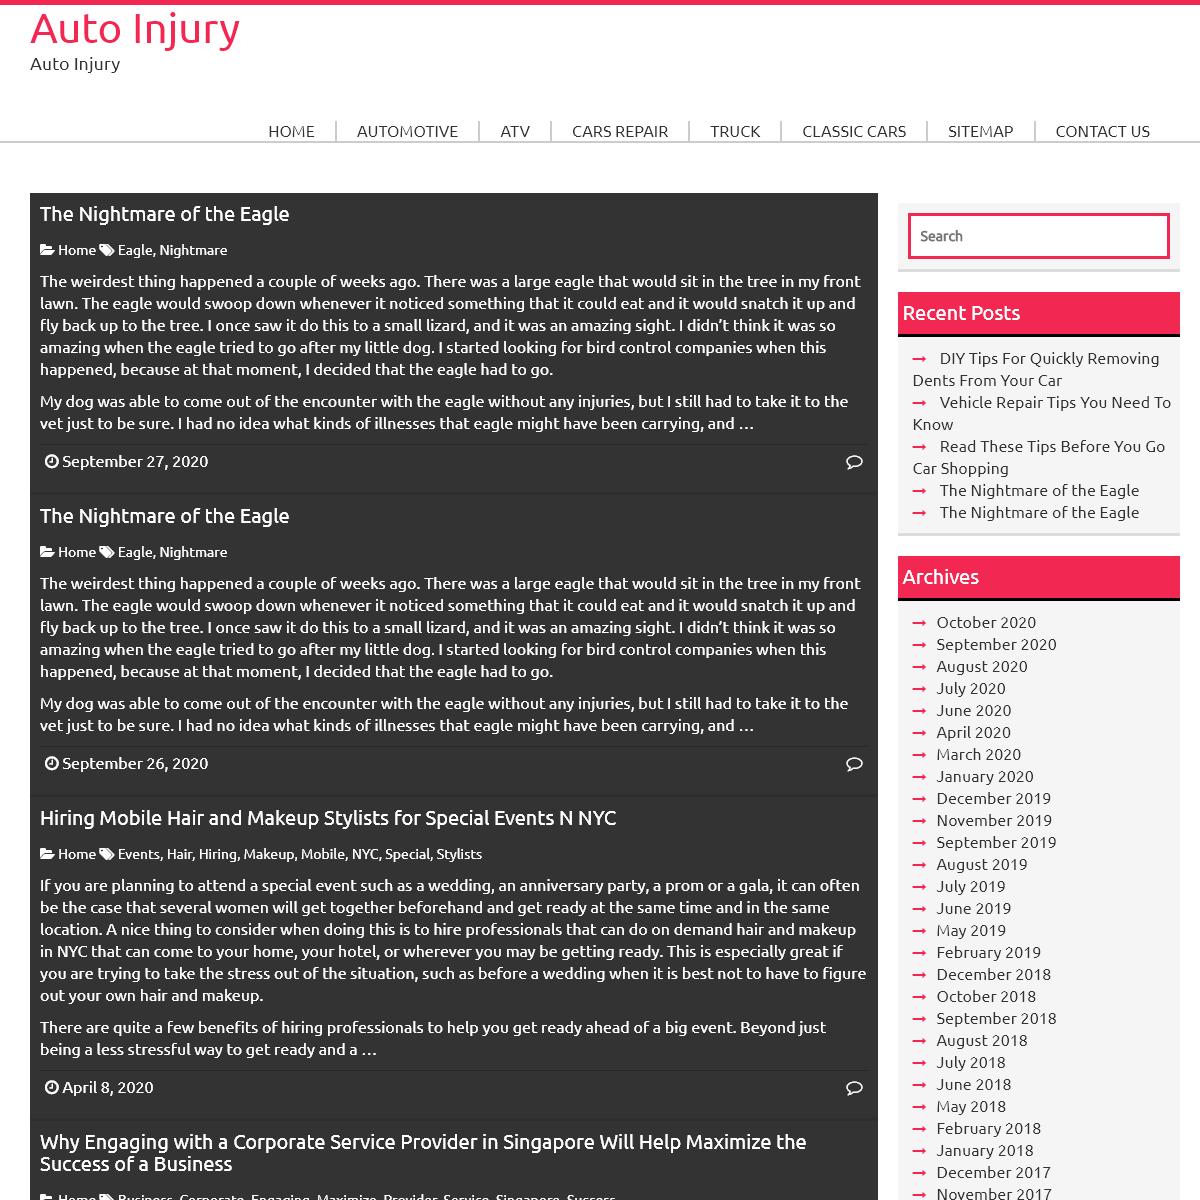 Auto Injury - Auto Injury